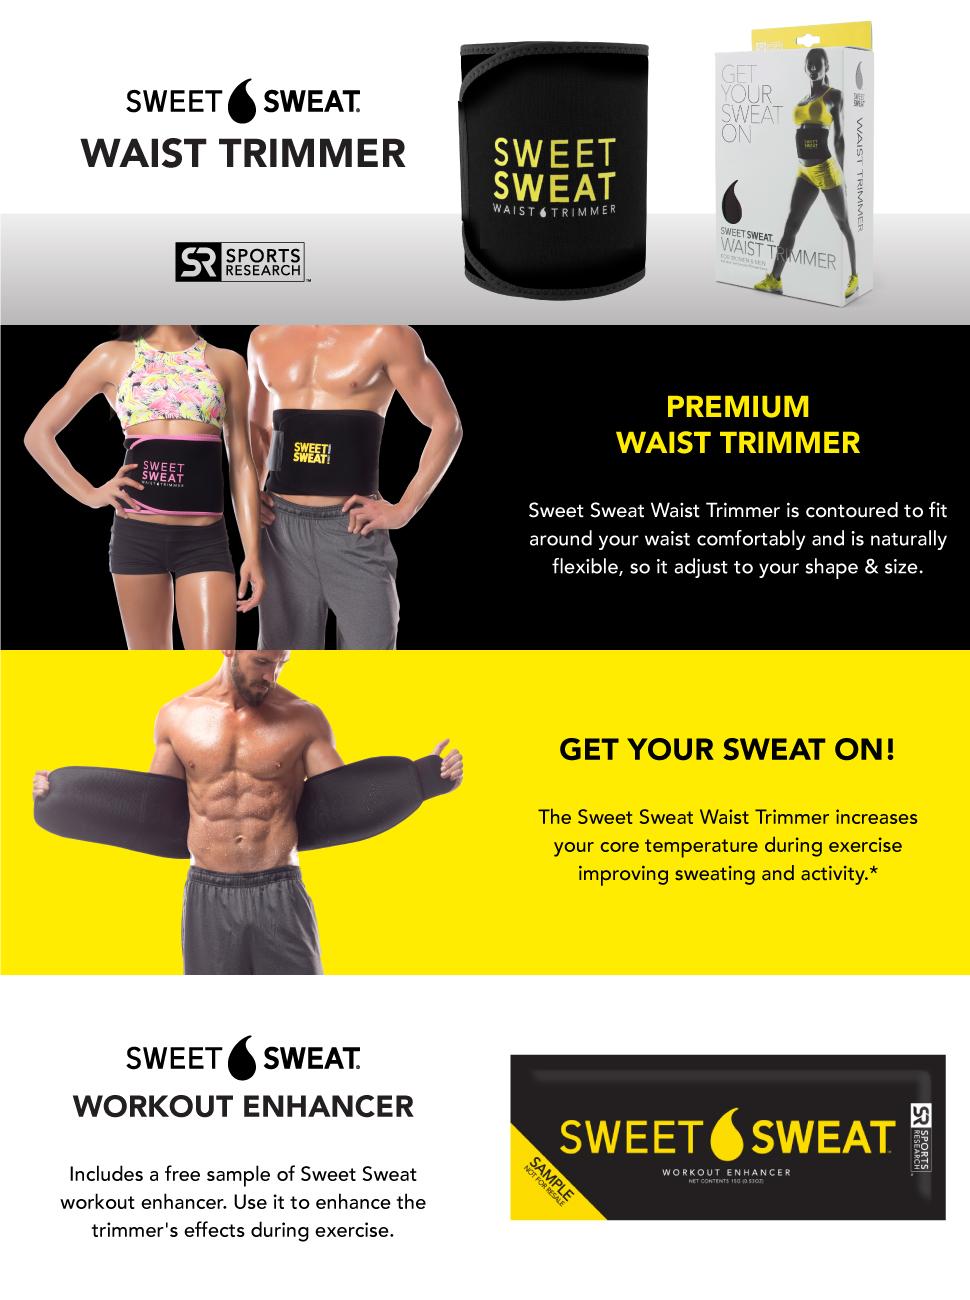 9f22be4dbb Sweet Sweat Premium Waist Trimmer Workout Enhancer Promotes Weight ...